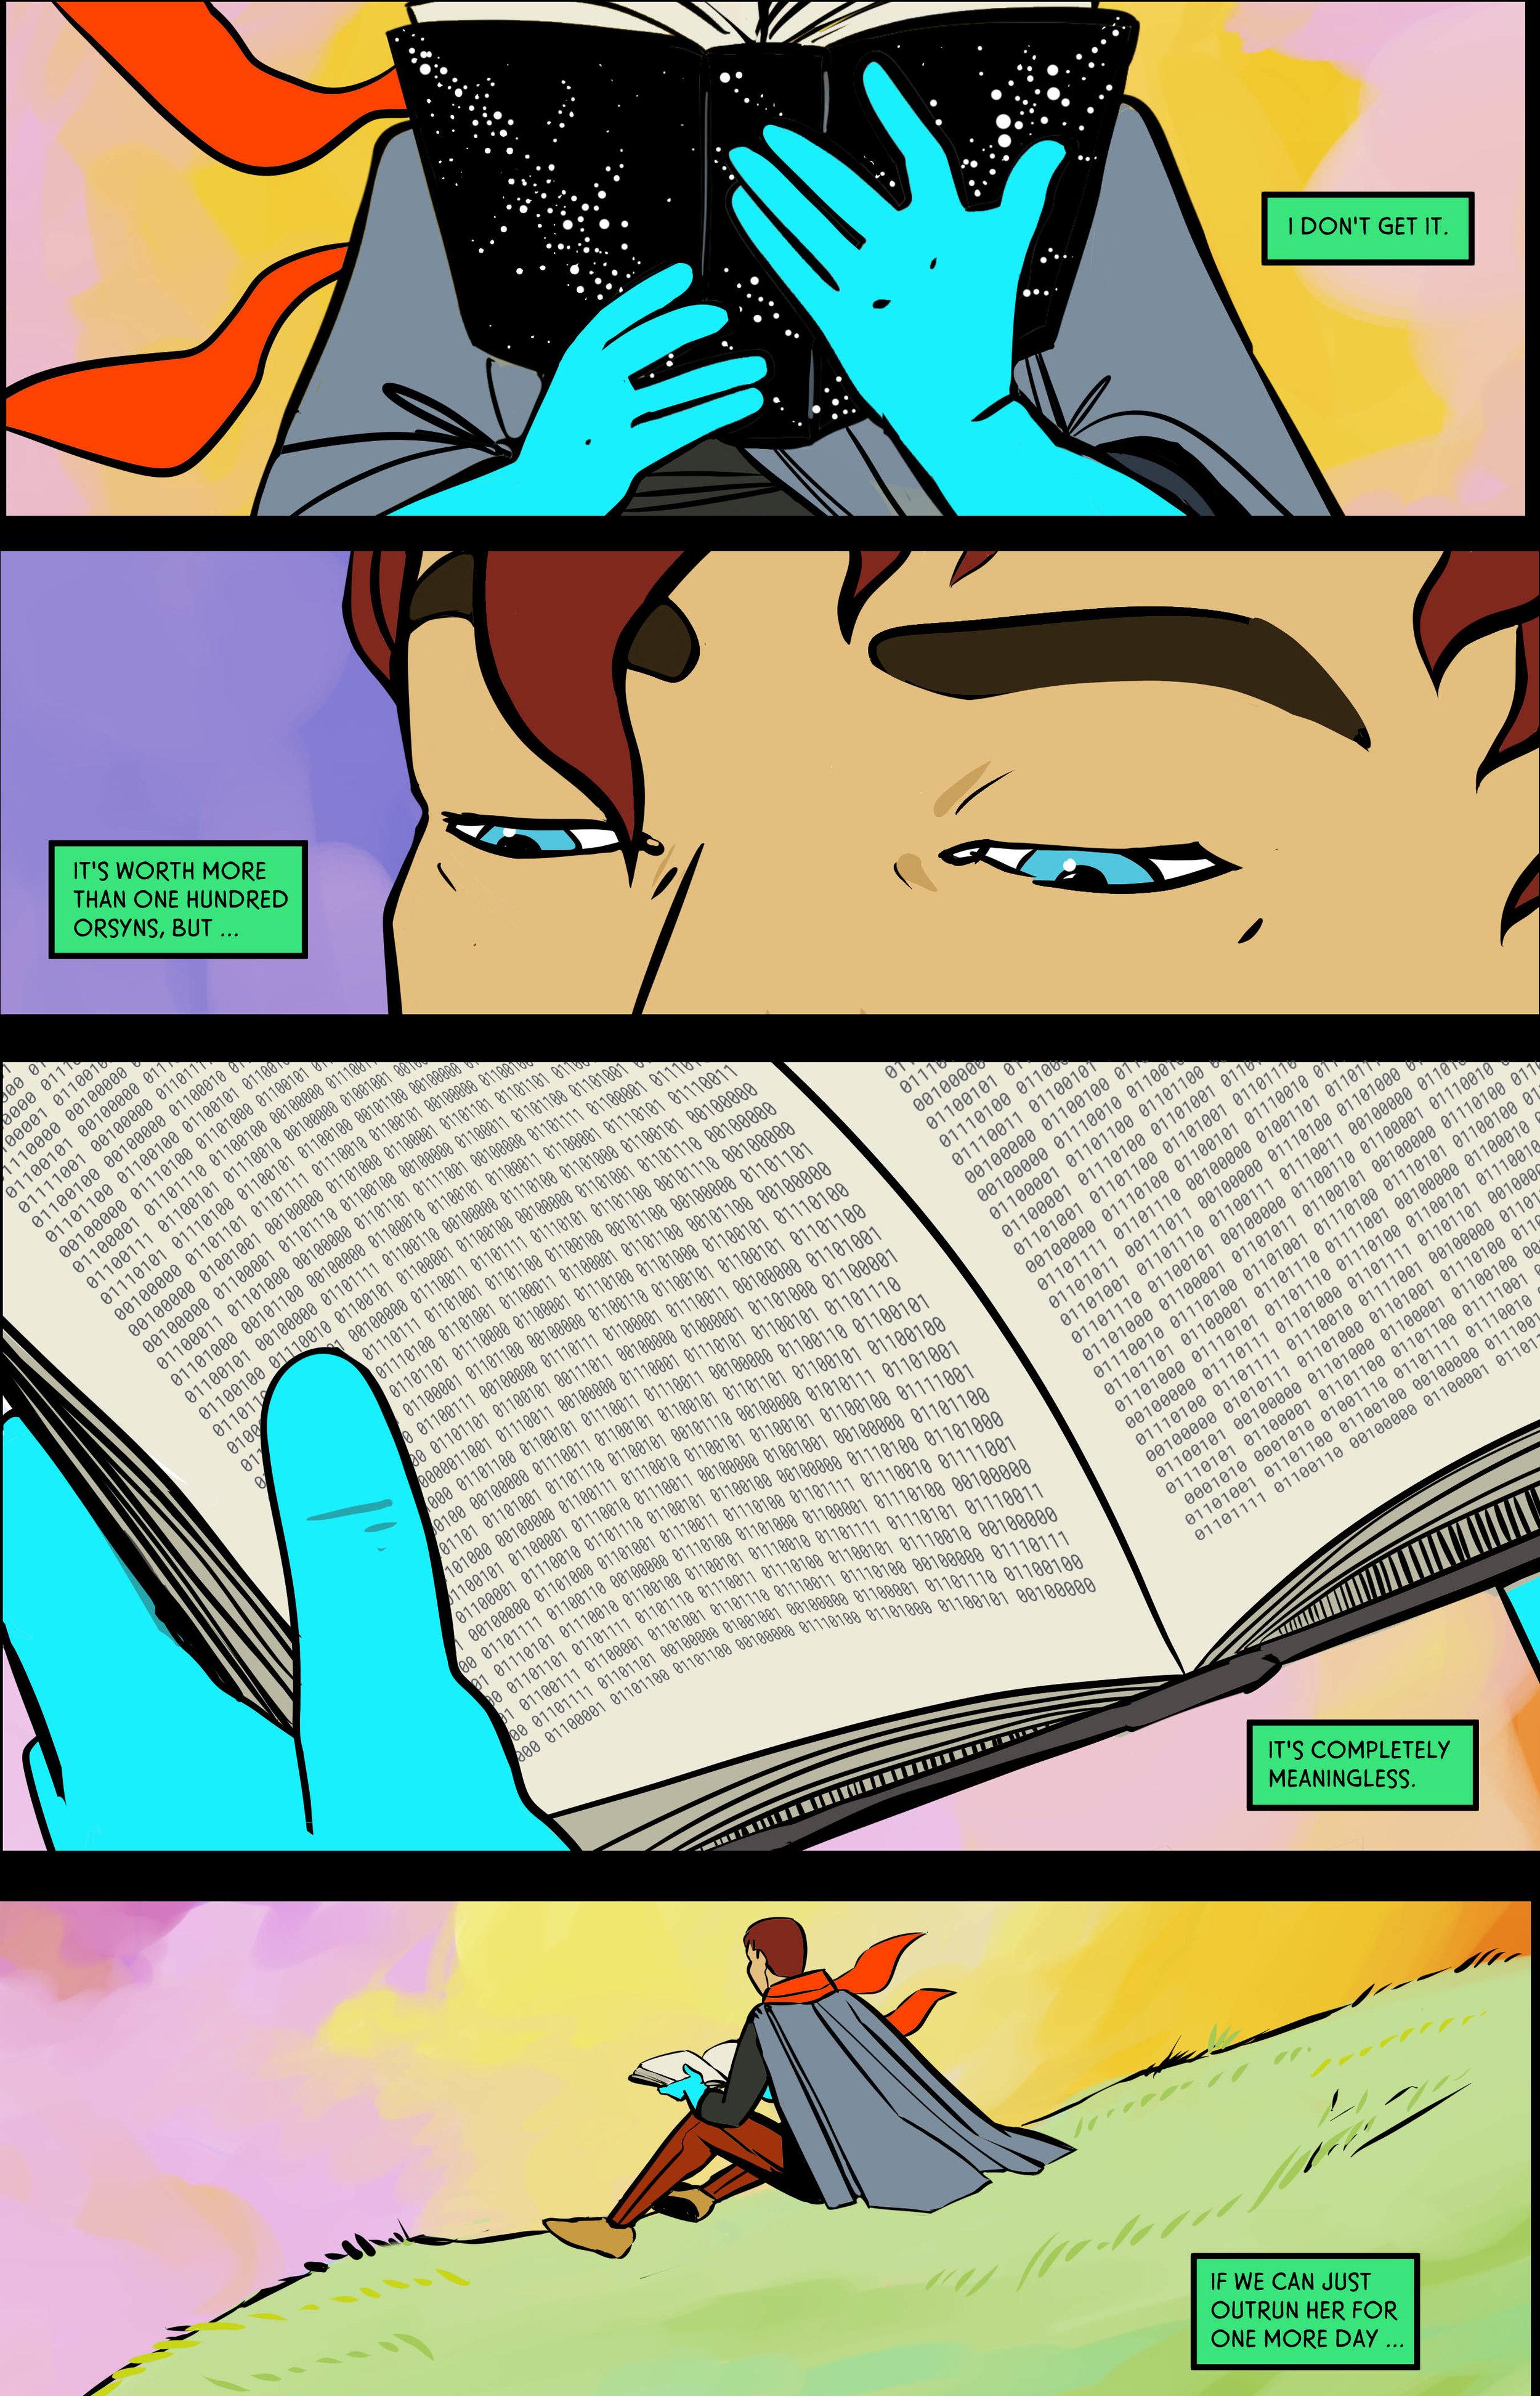 Sam and the book binary.jpg